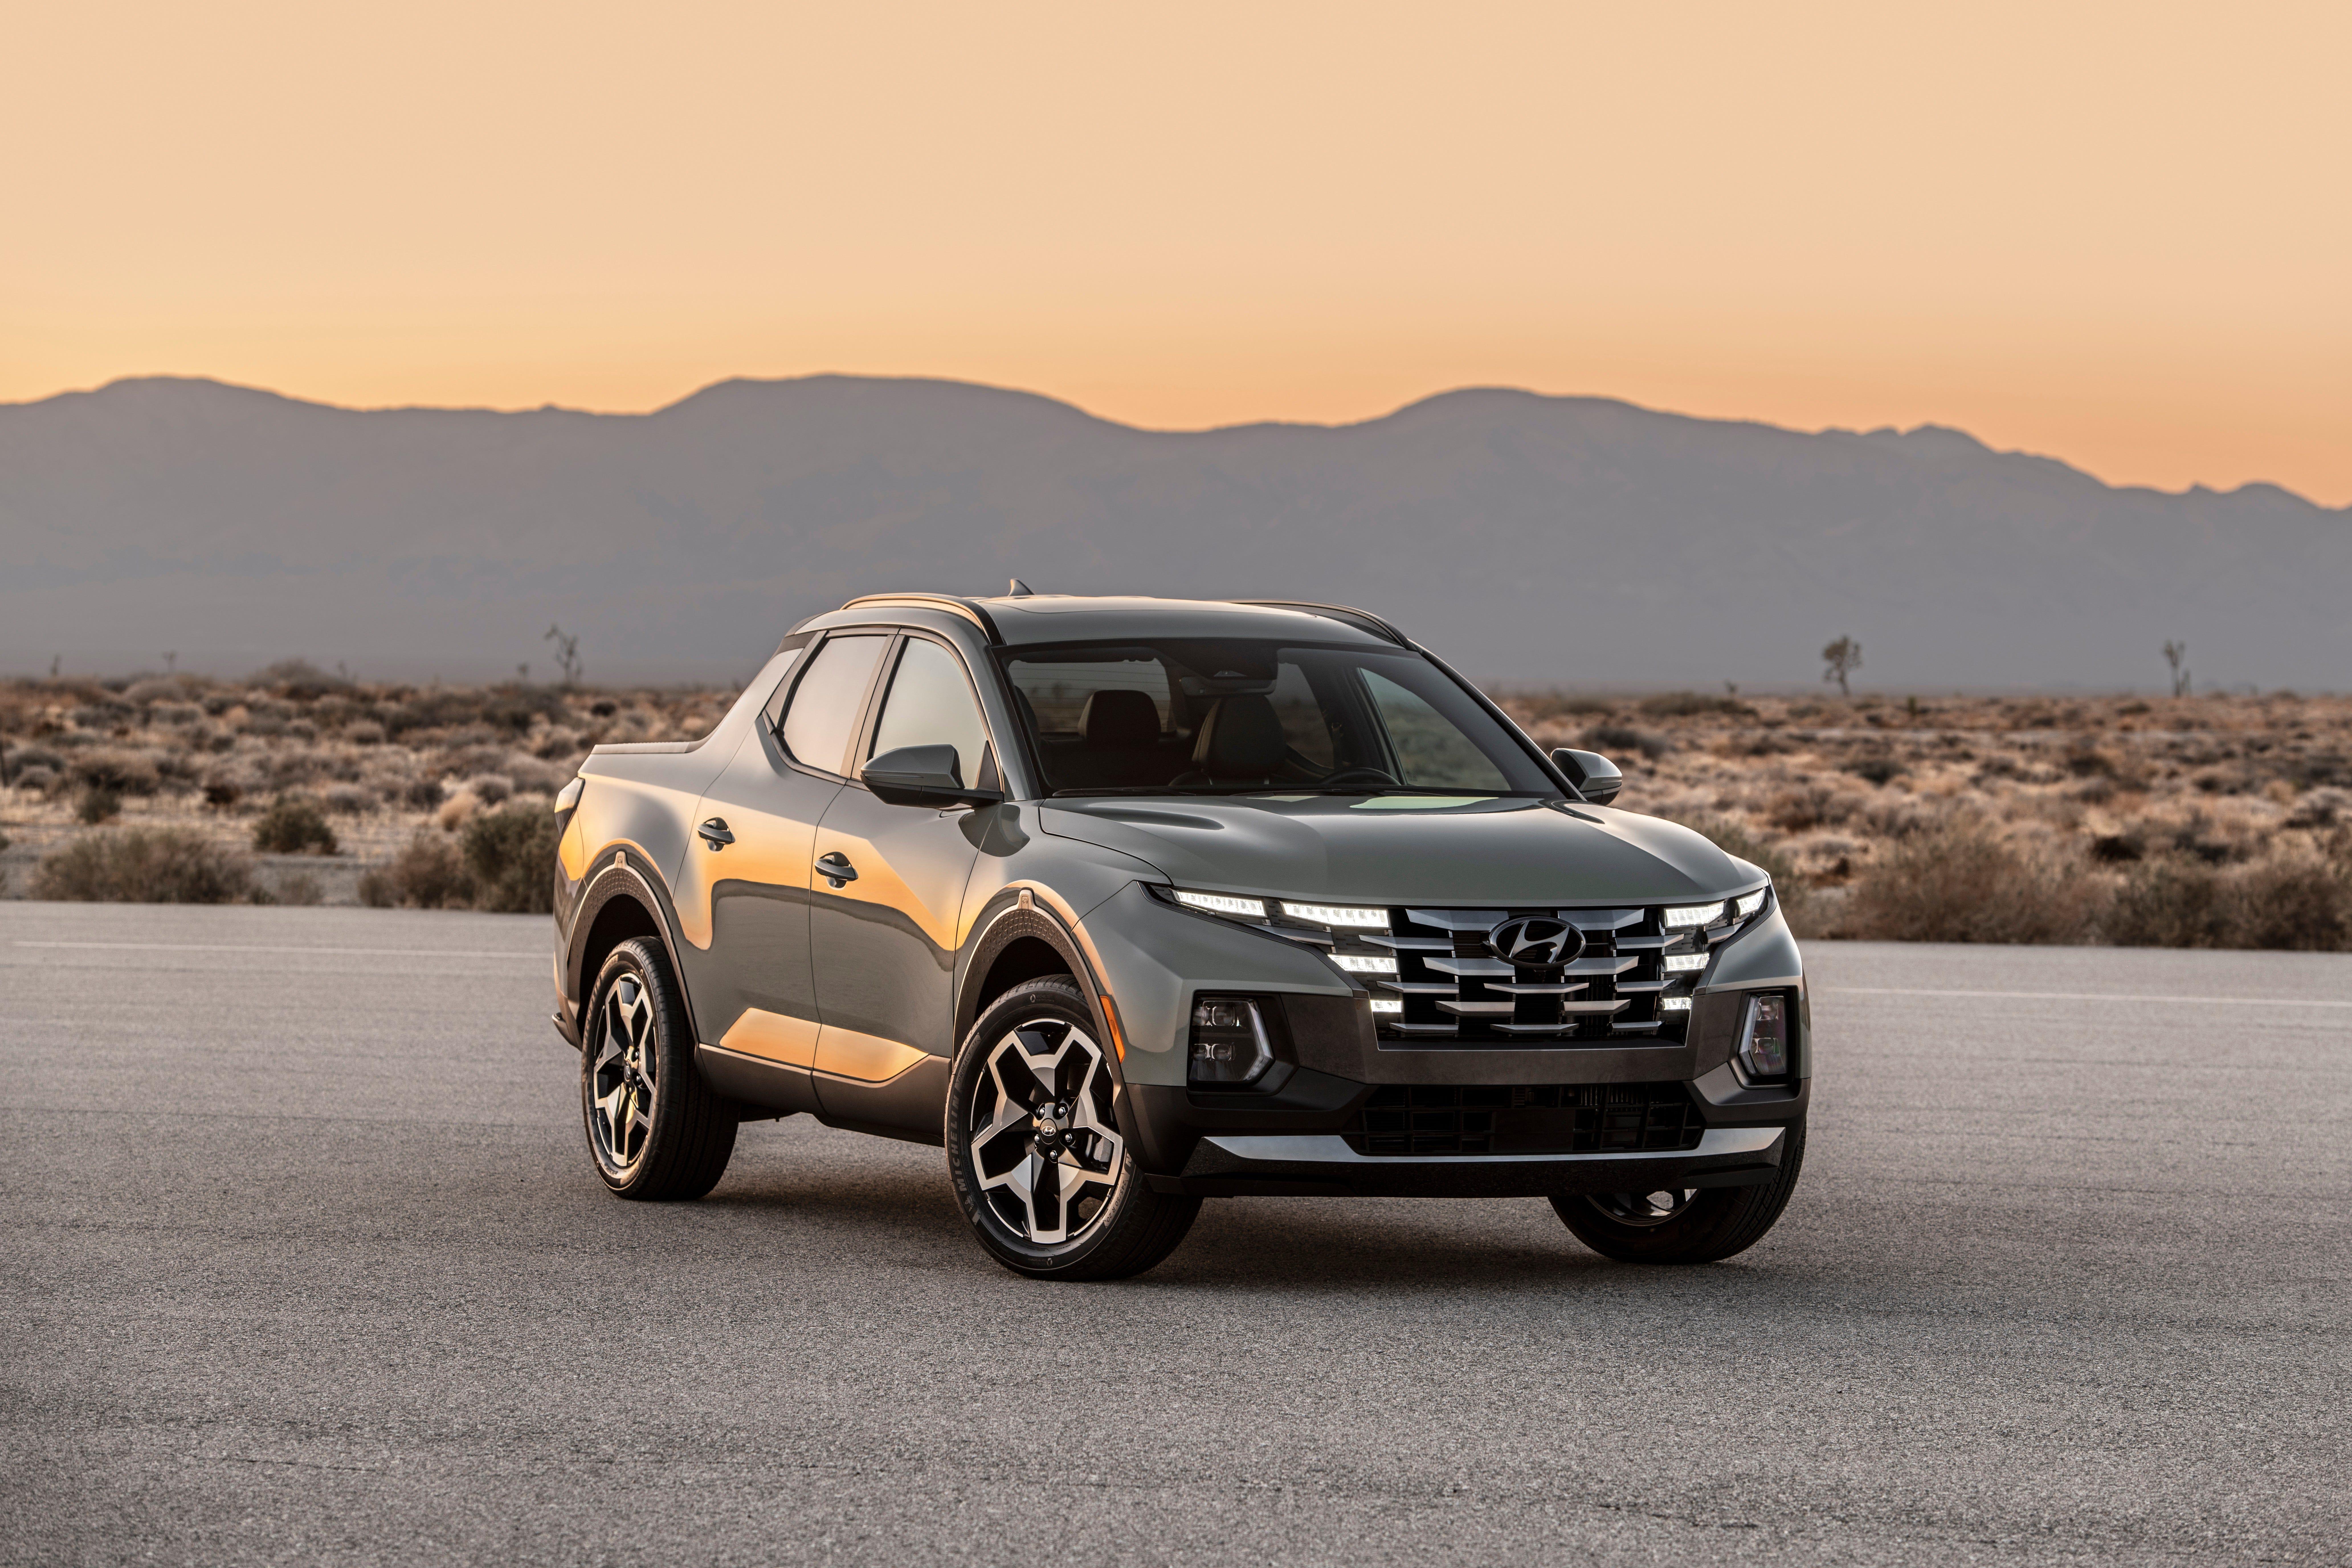 Compact pickups poised for a comeback as Hyundai Santa Cruz, Ford Maverick generate buzz